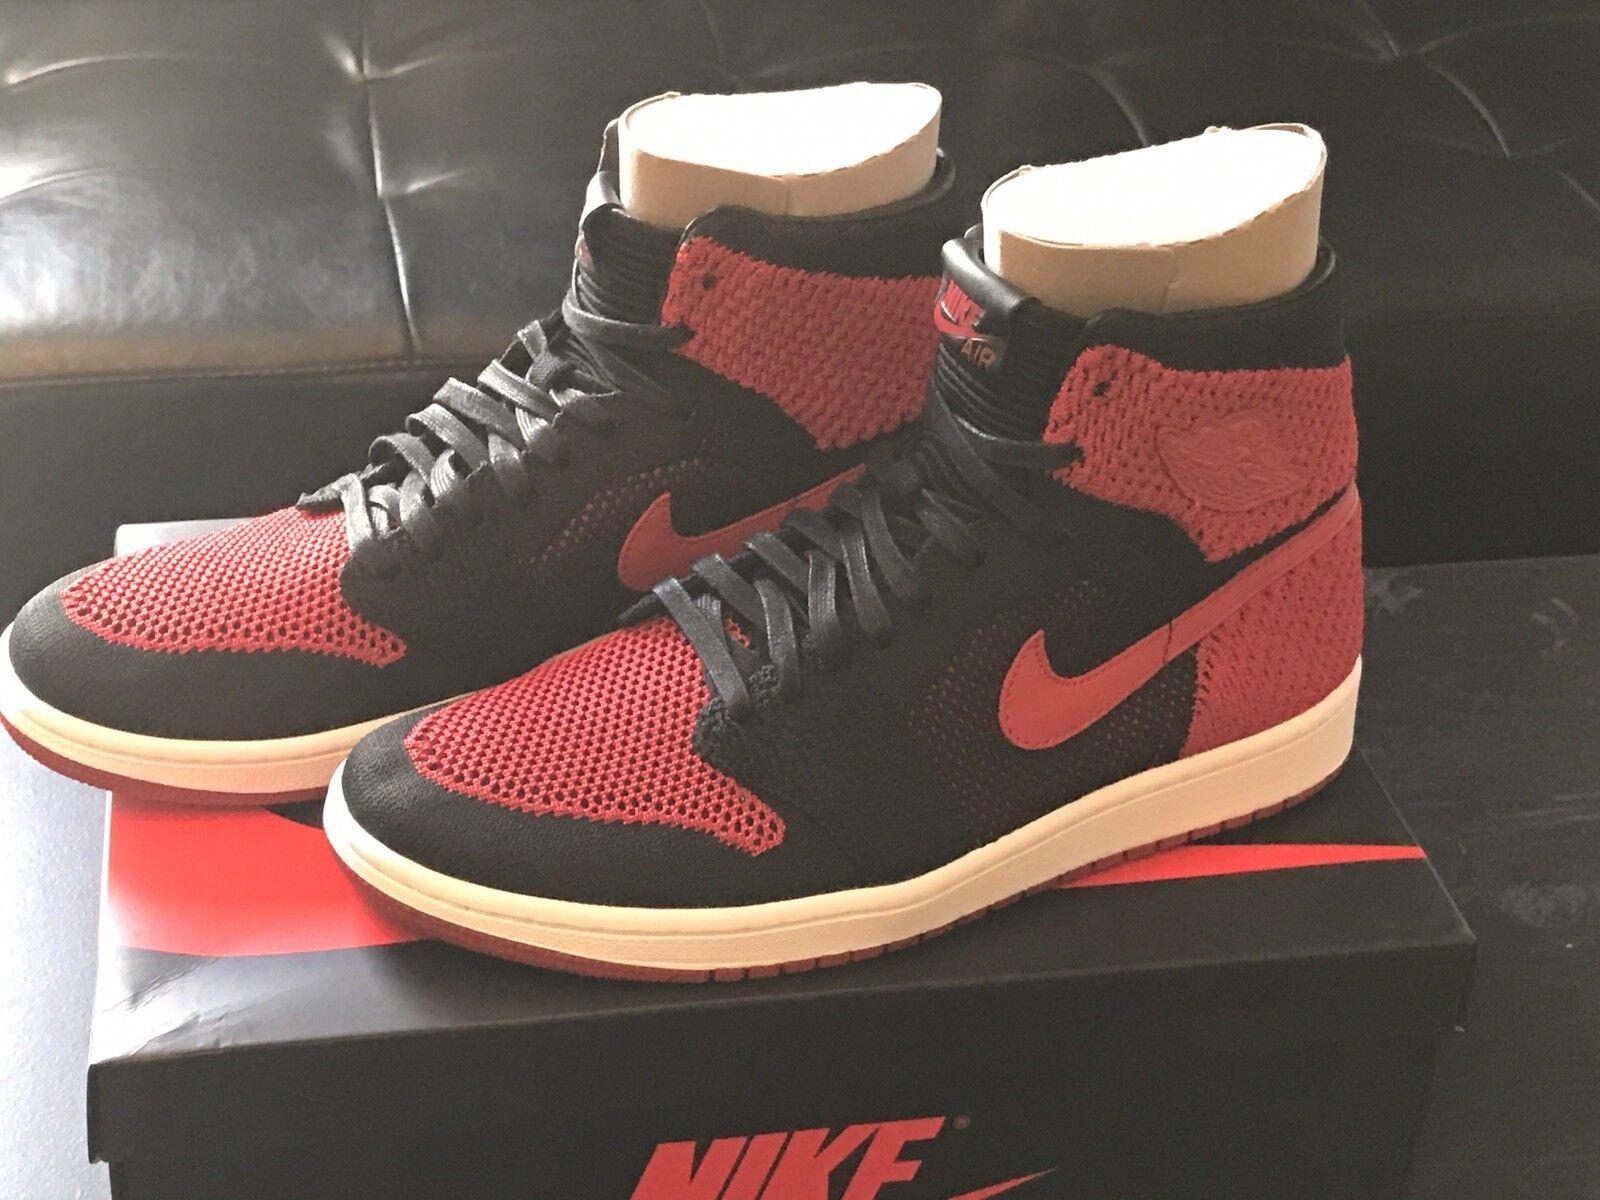 Nike Air Jordan Retro 1 High Banned Flyknit Bred Black Red